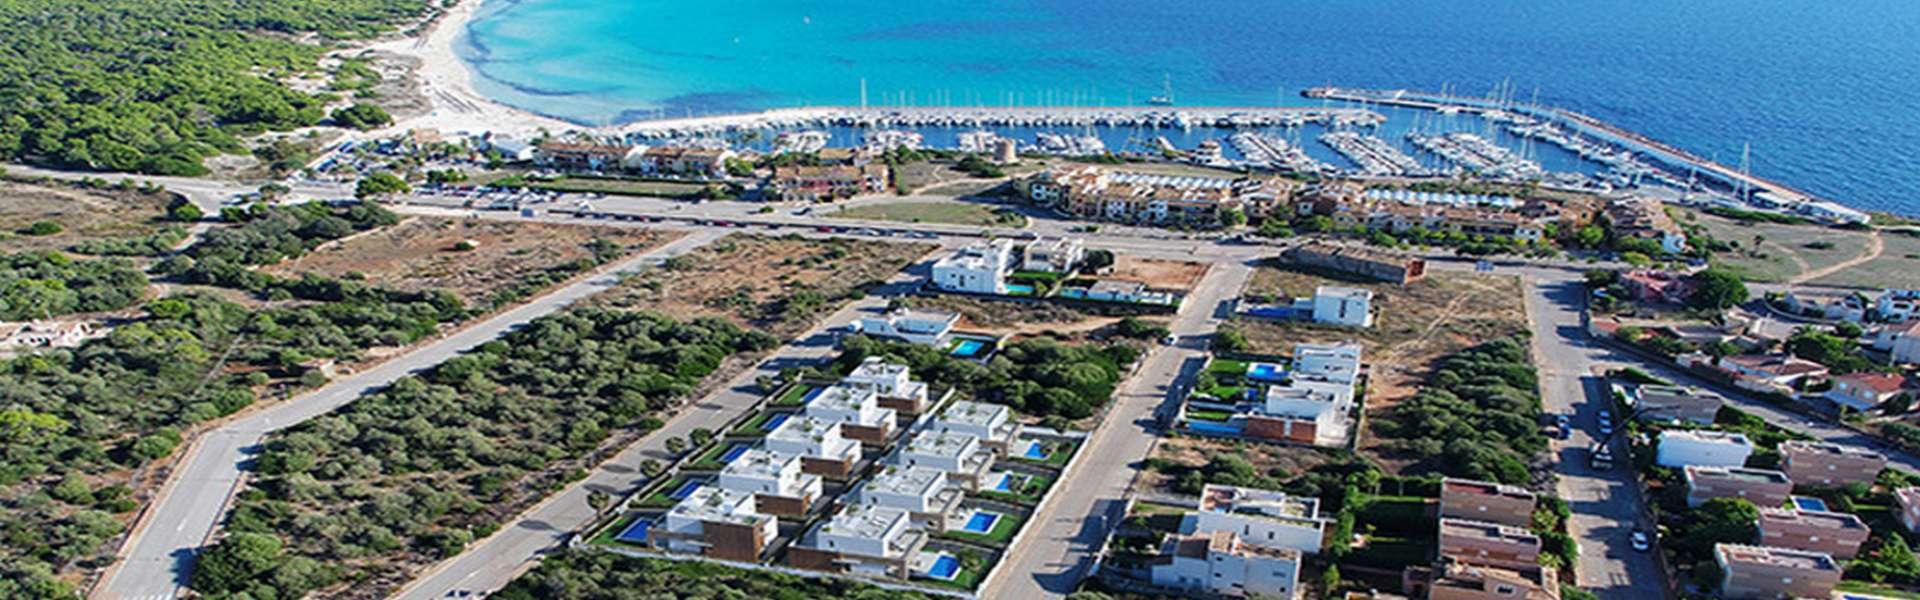 Luxus-Villa in unmittelbarer Strandnähe in Sa Ràpita